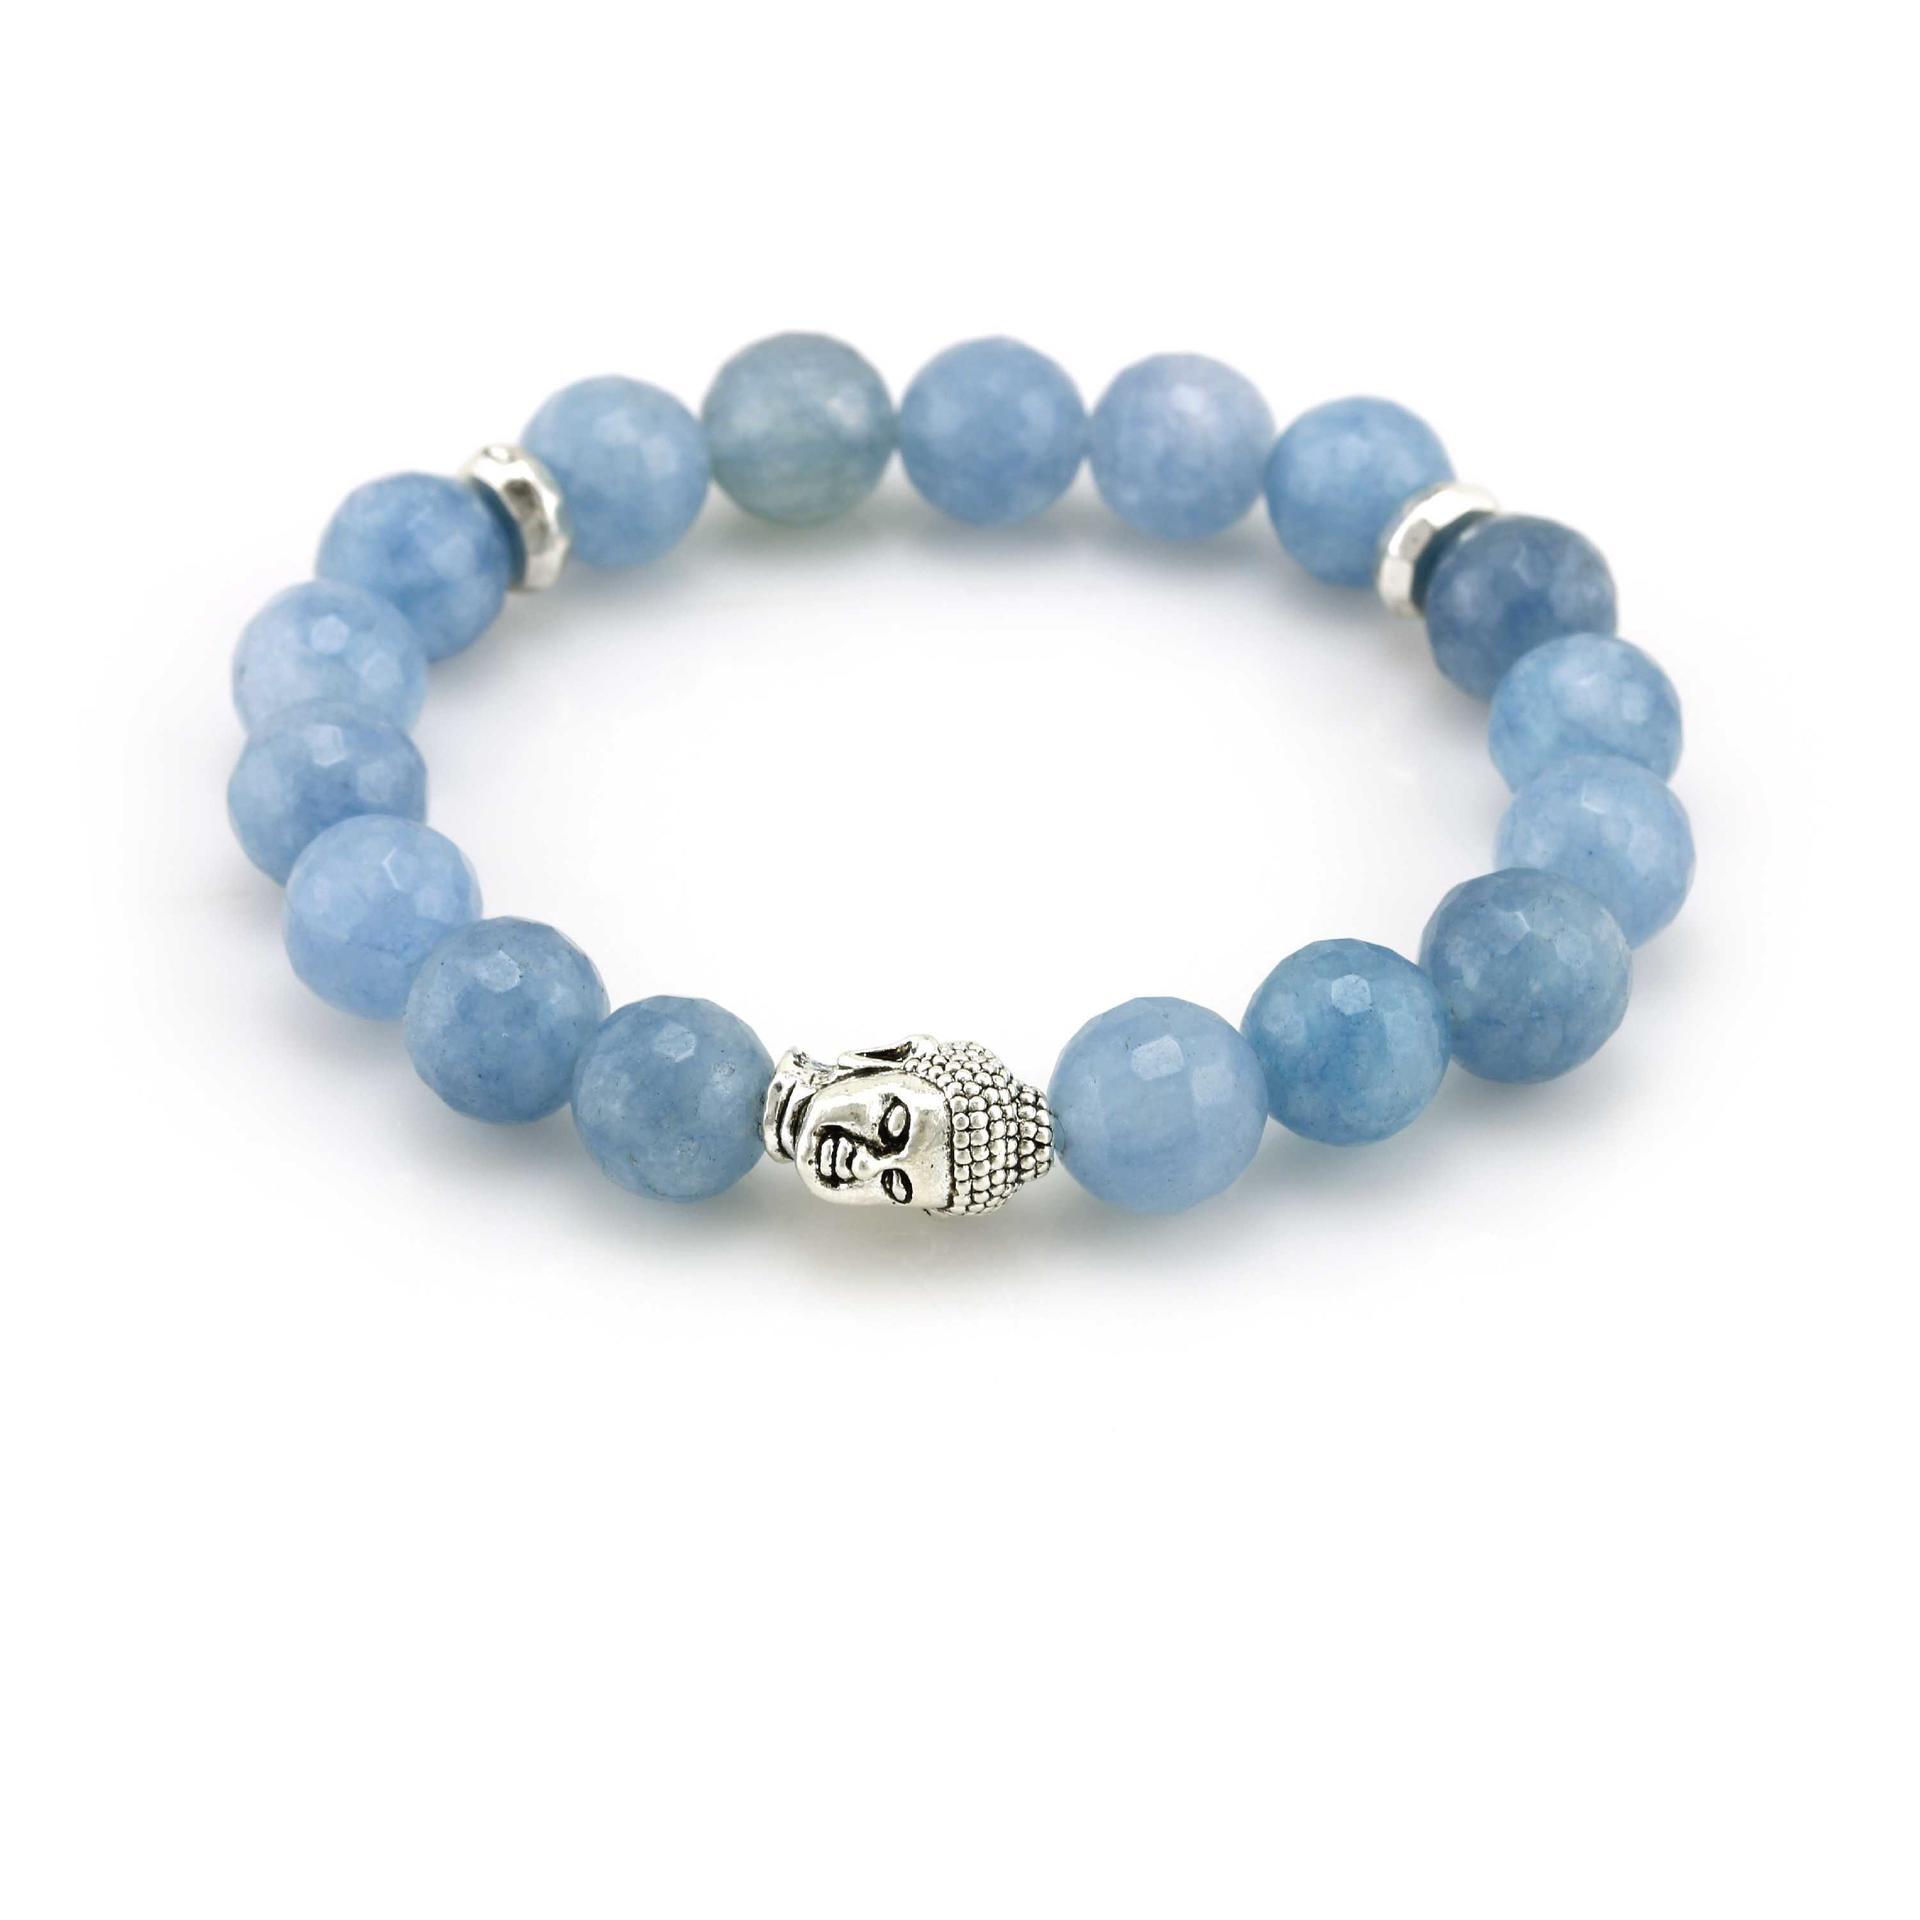 chakra healing bracelet meditation handmade Warranty TTT Jewelry